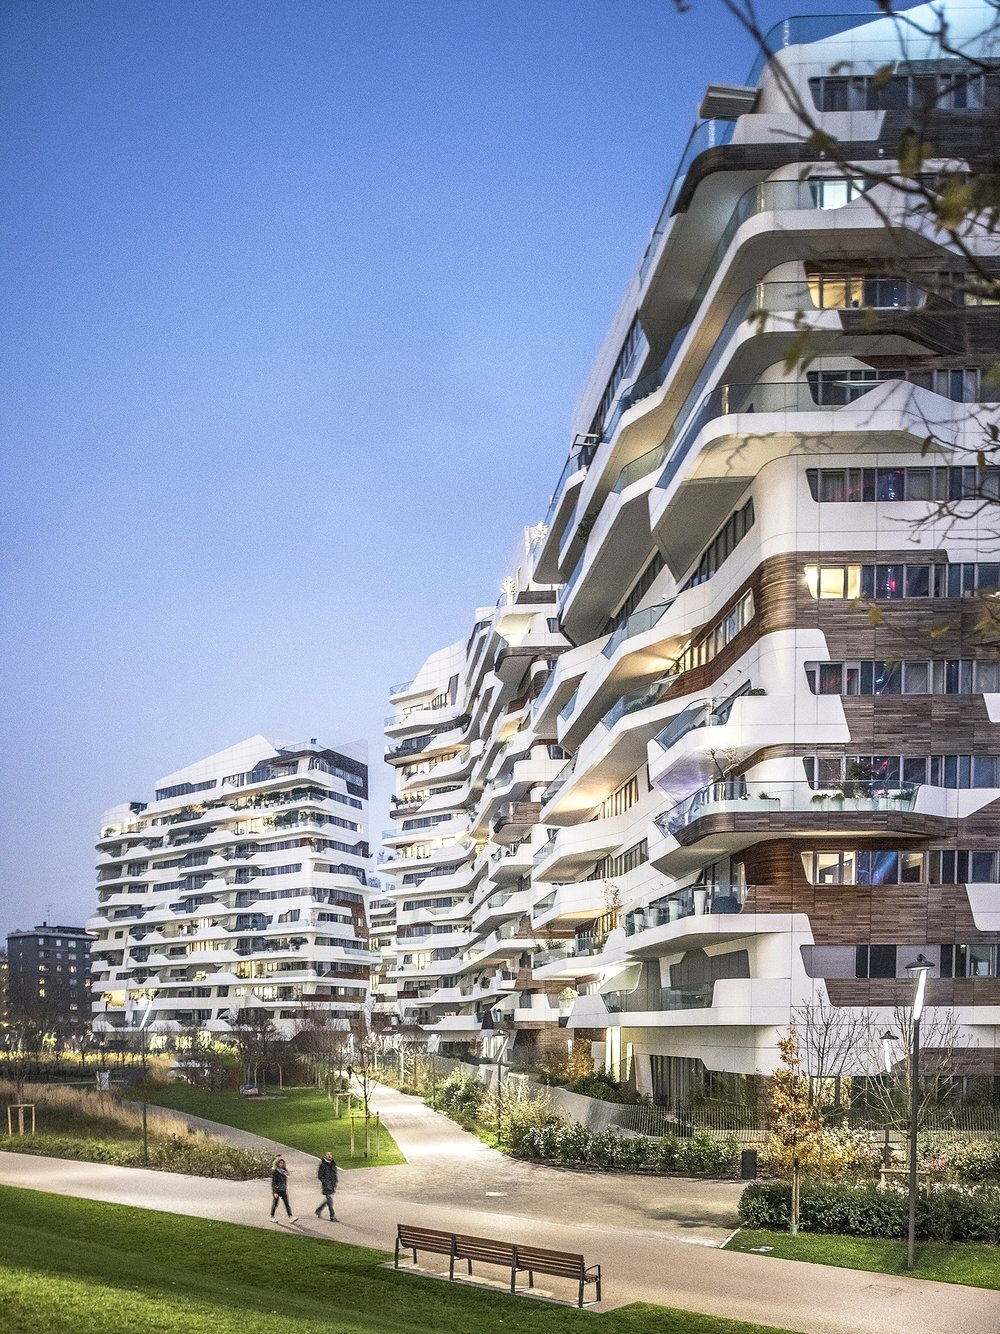 City Life Milan - Zaha Hadid